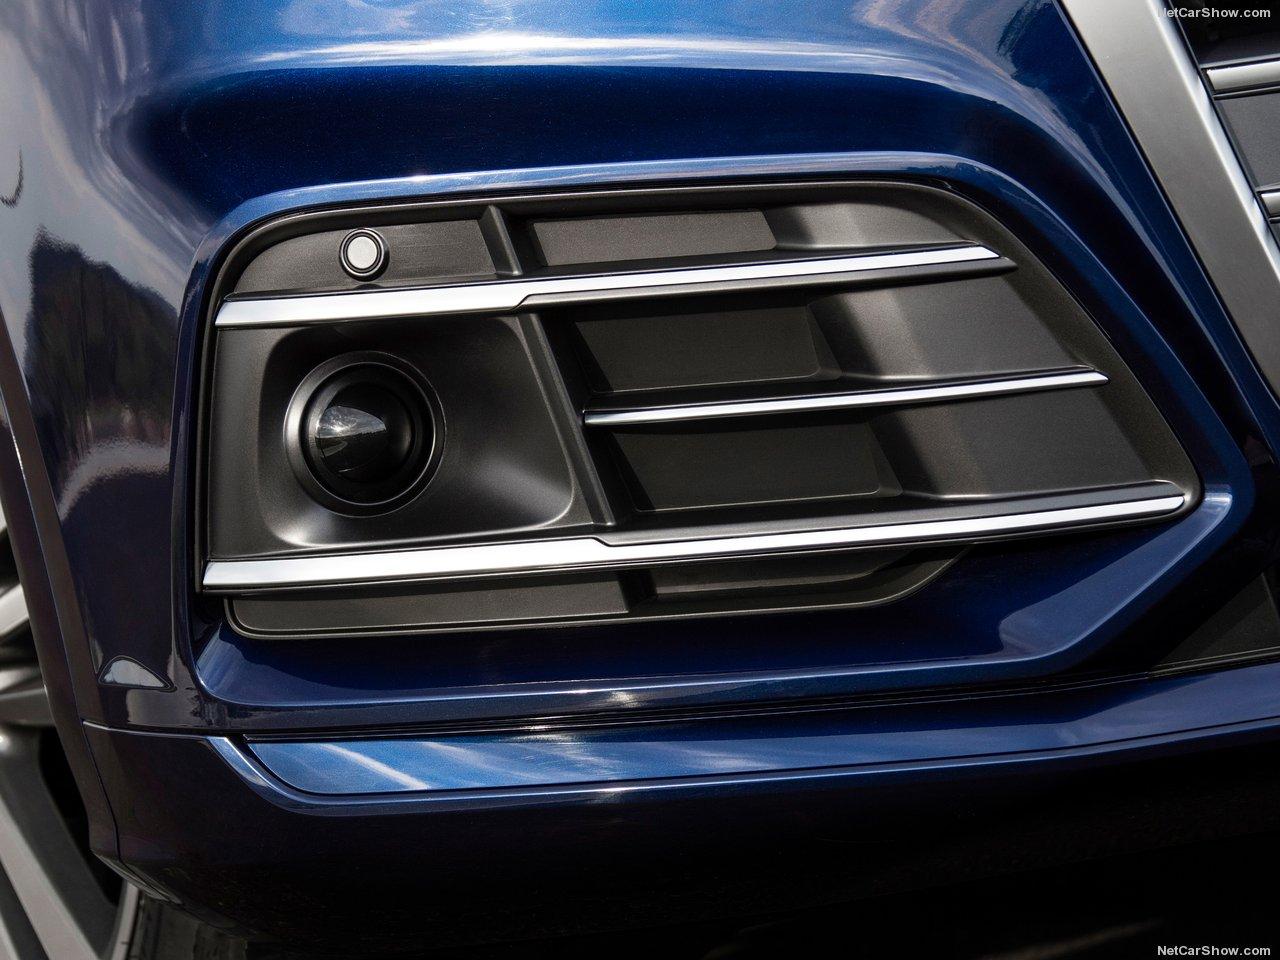 Audi-Q5-2017-1280-9d